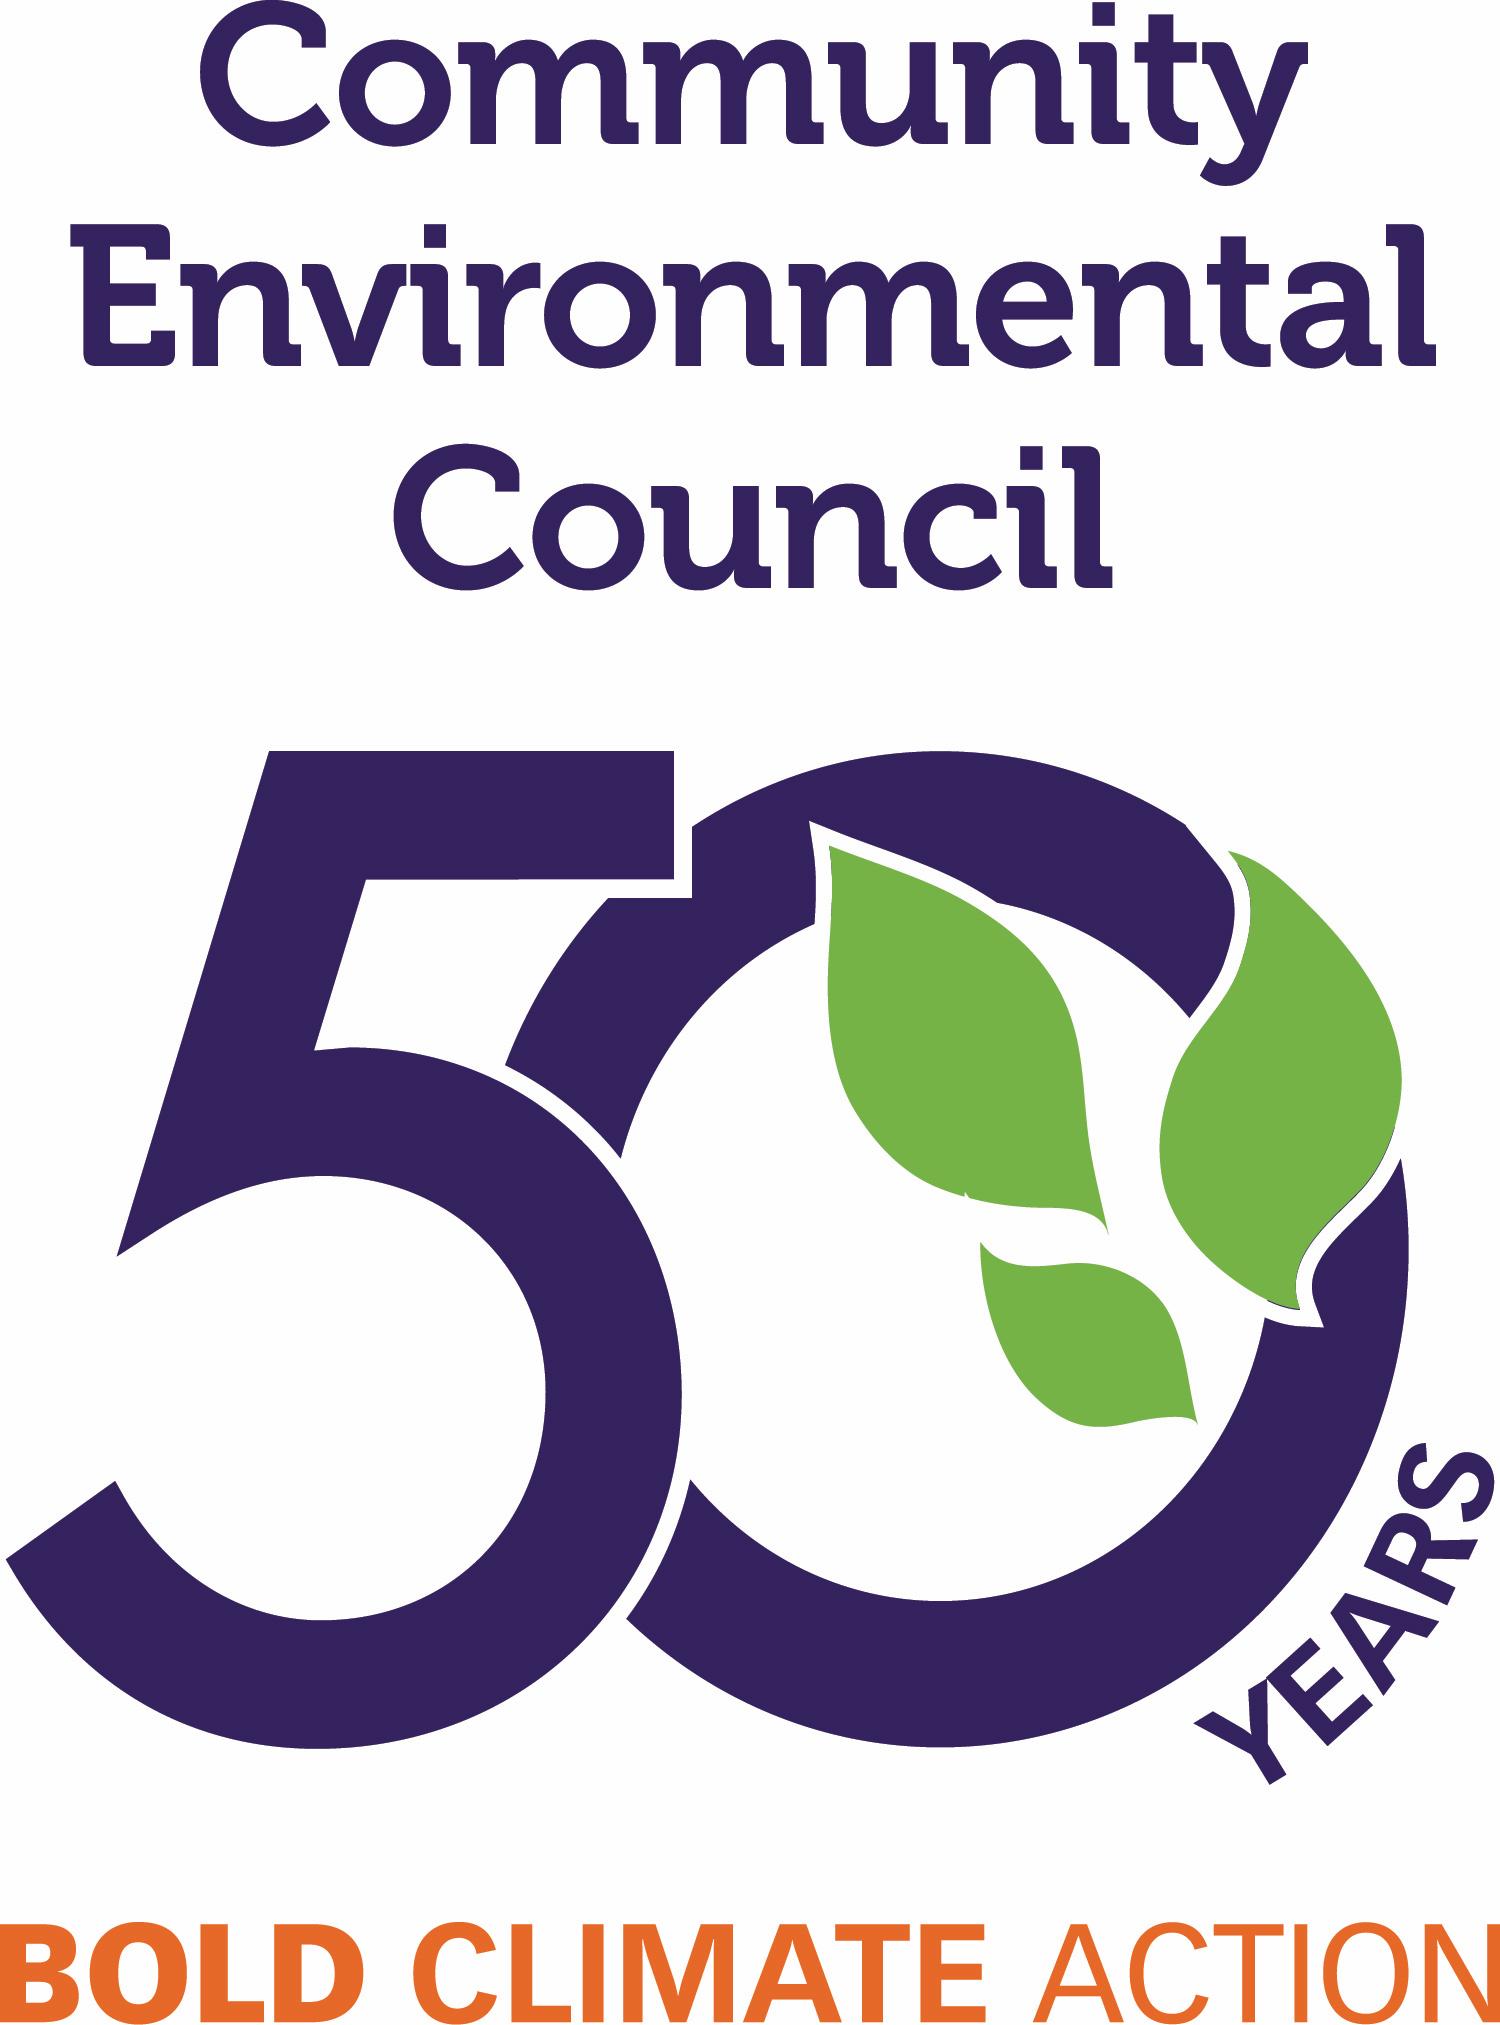 Community Environmental Council